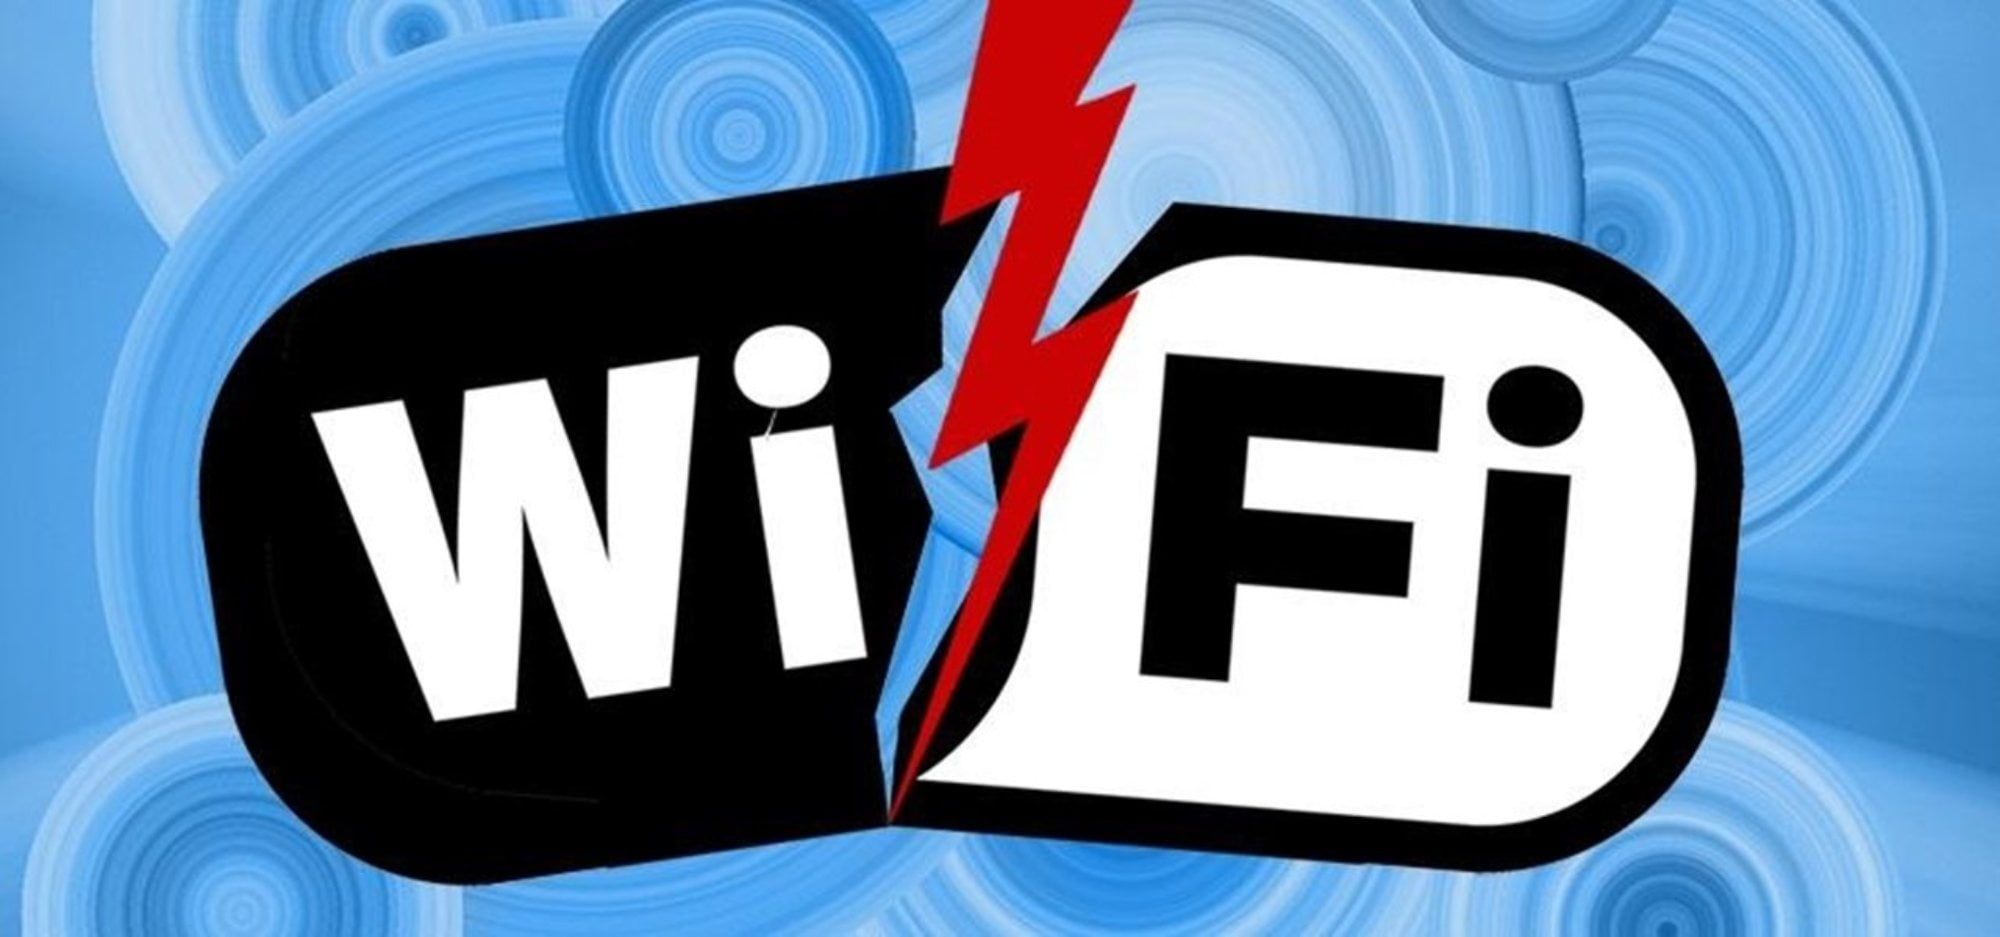 Взлом паролей WPA и WPA2 Wi-Fi при помощи Pixie-Dust атаки через баш-скрипт Airgeddon